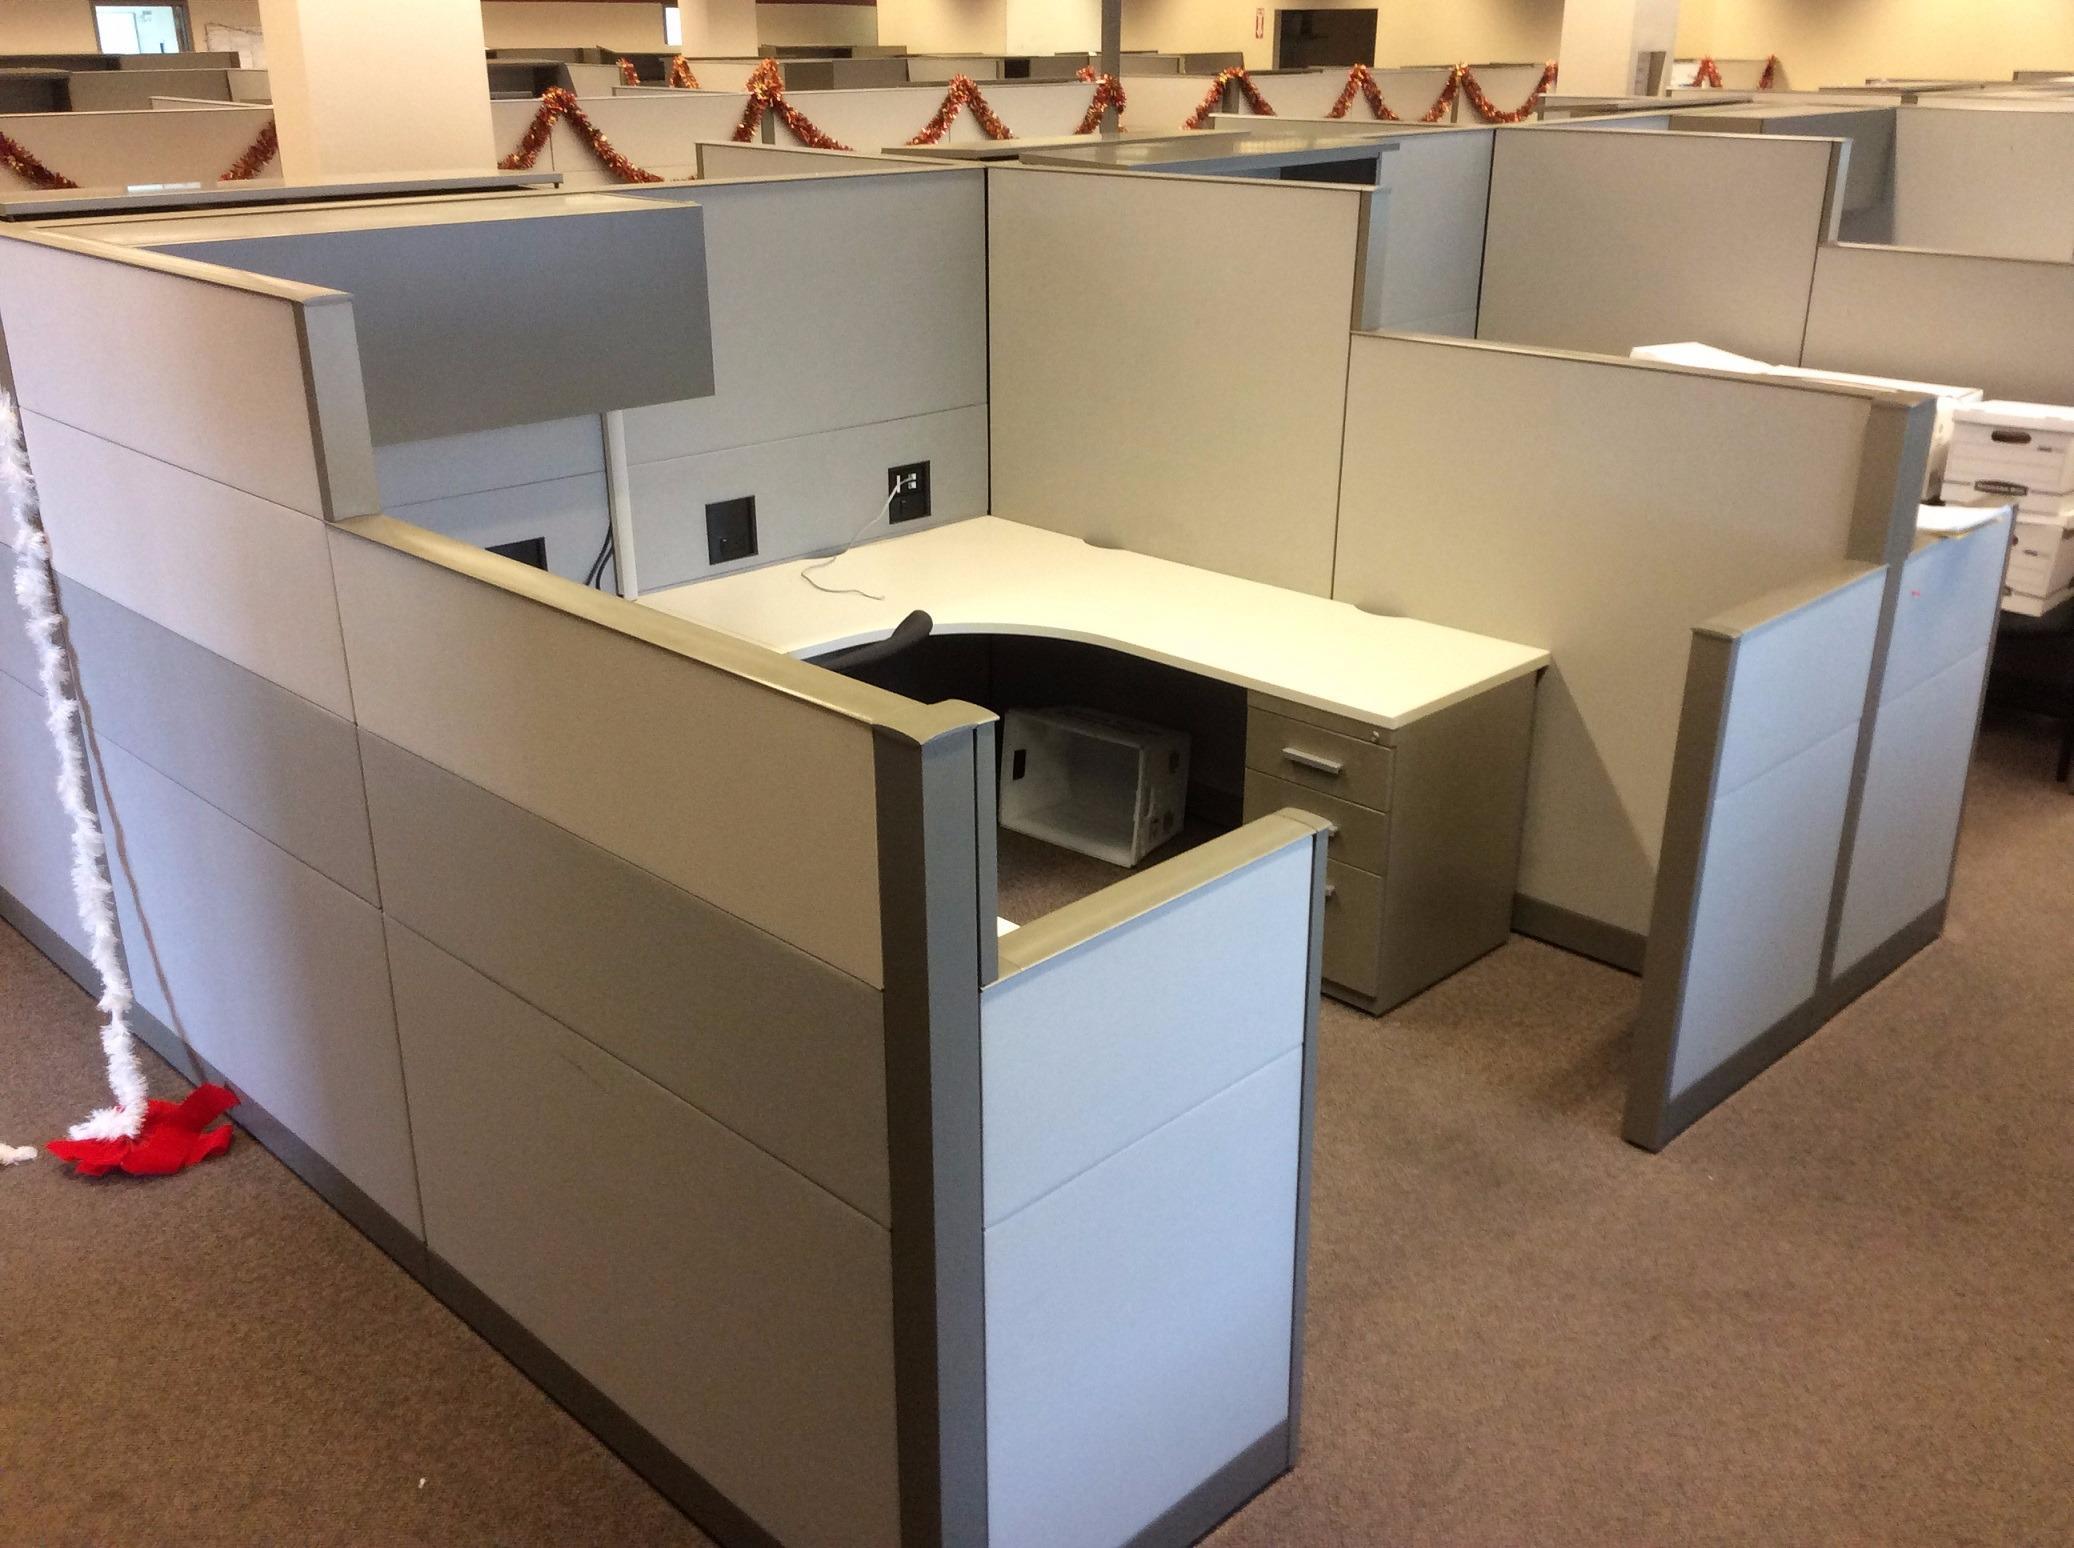 Office Furniture Equipment Used In Cincinnati Oh Cincinnati Ohio Office Furniture